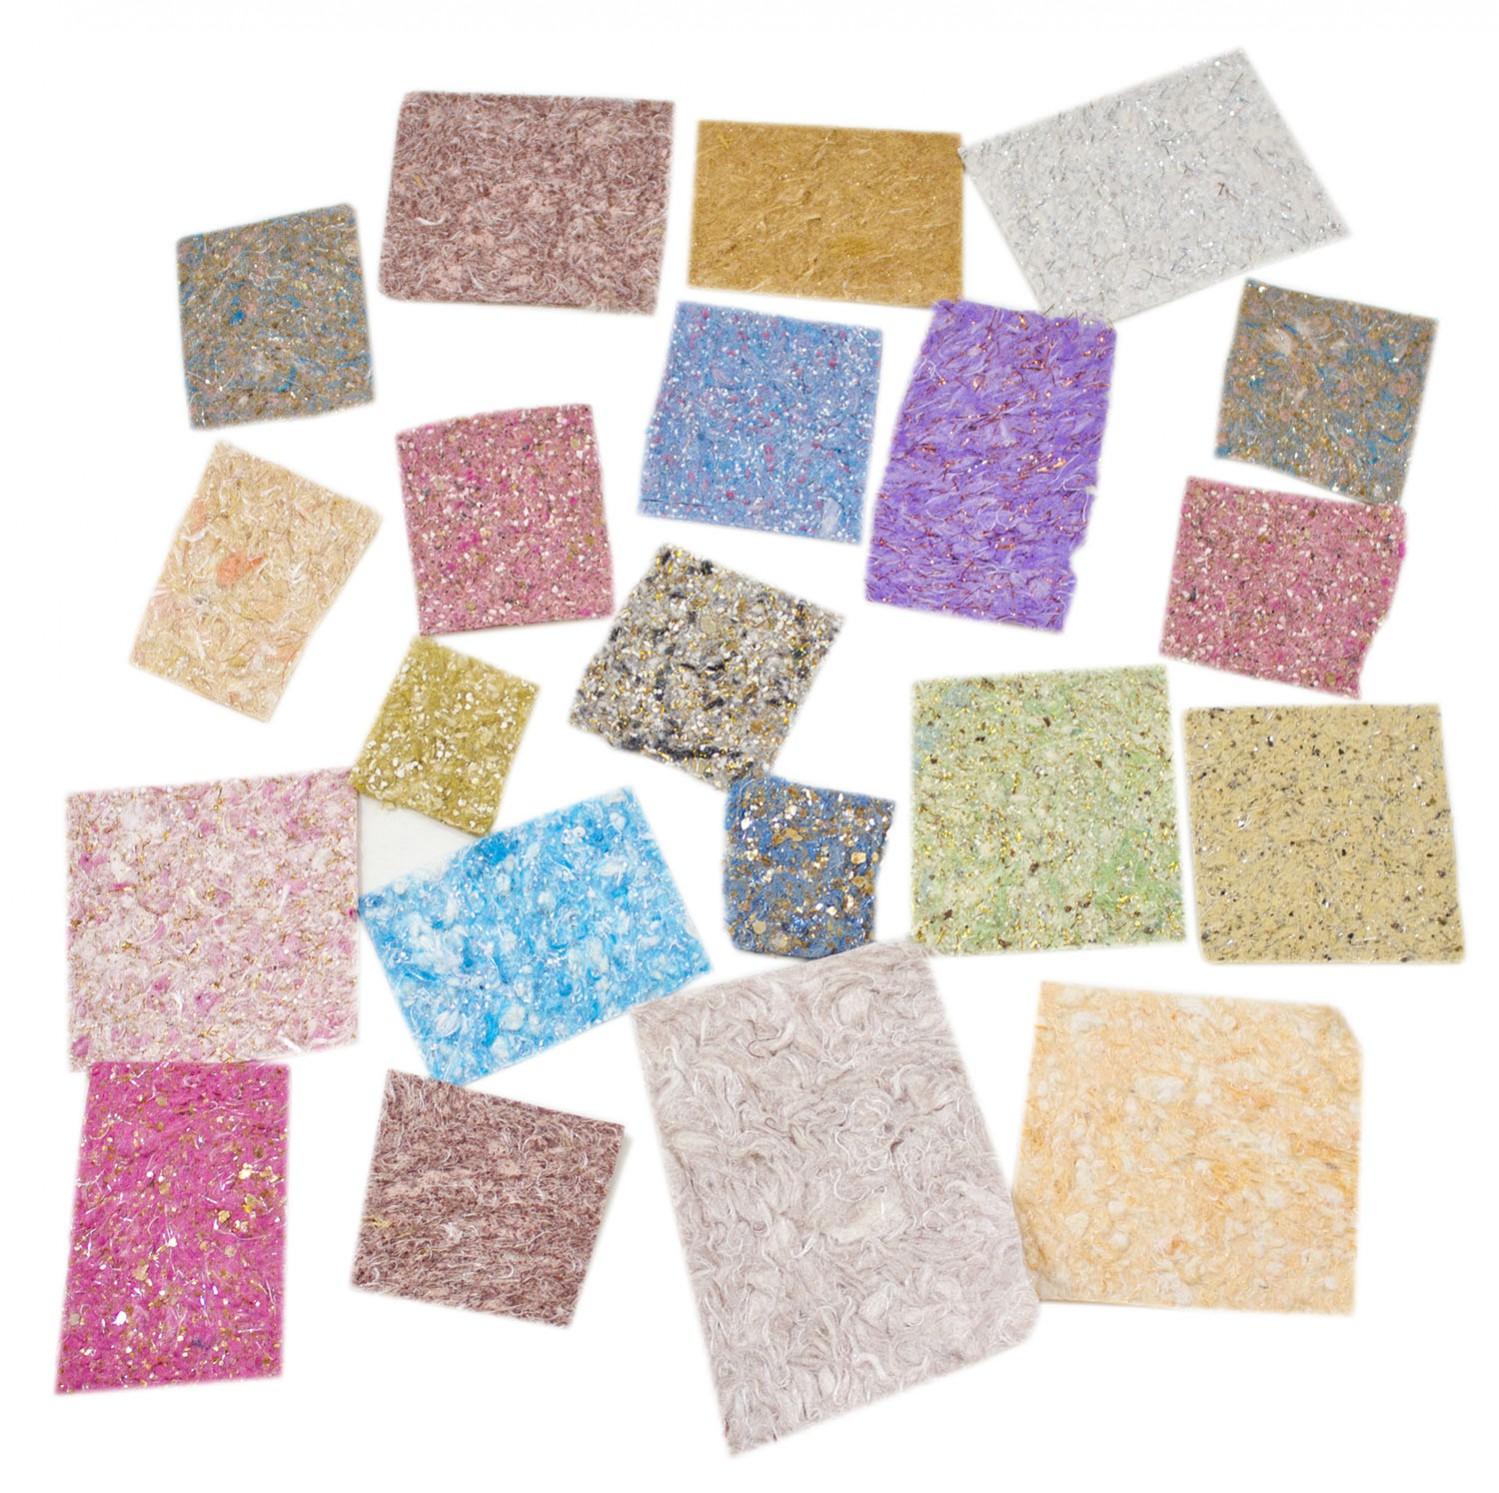 Liquid wallpaper waste paper do it yourself 19